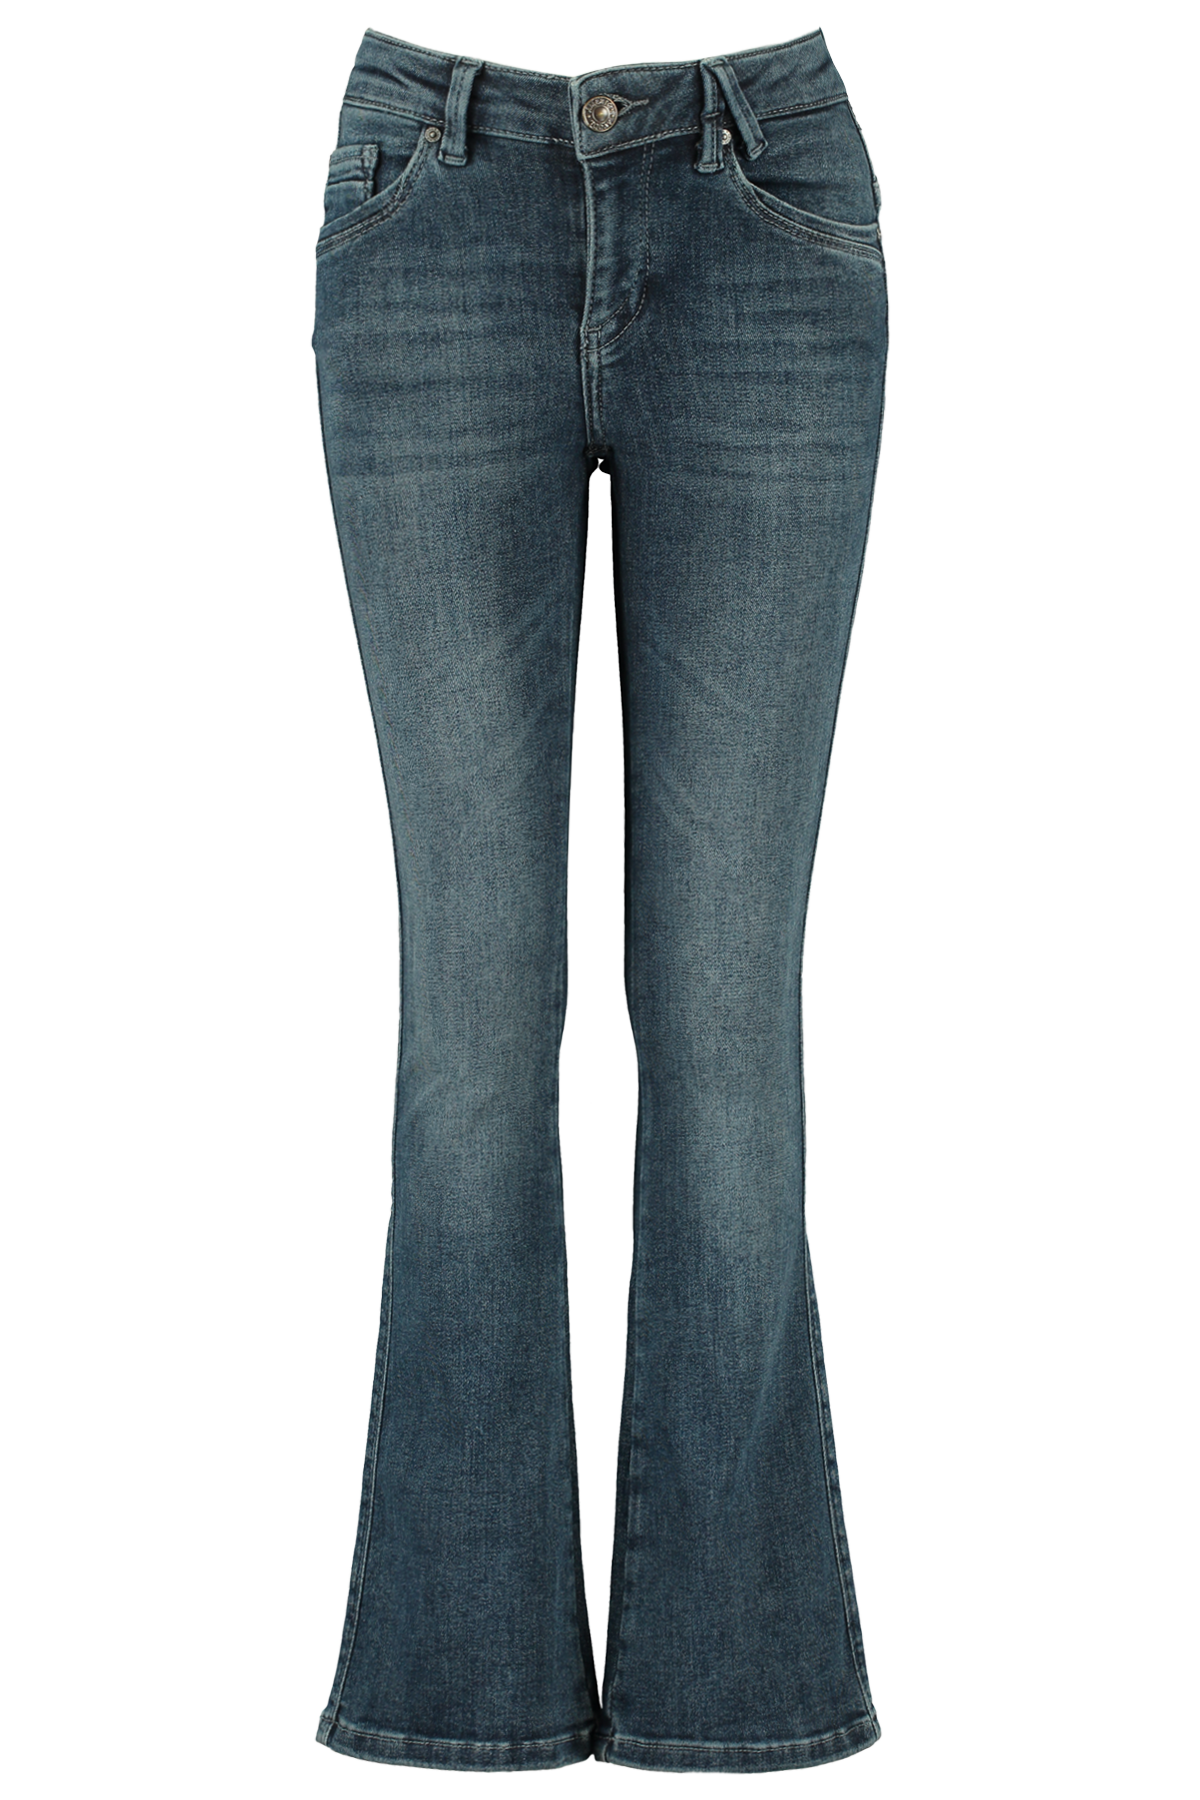 Jeans Emily Flare Jr.